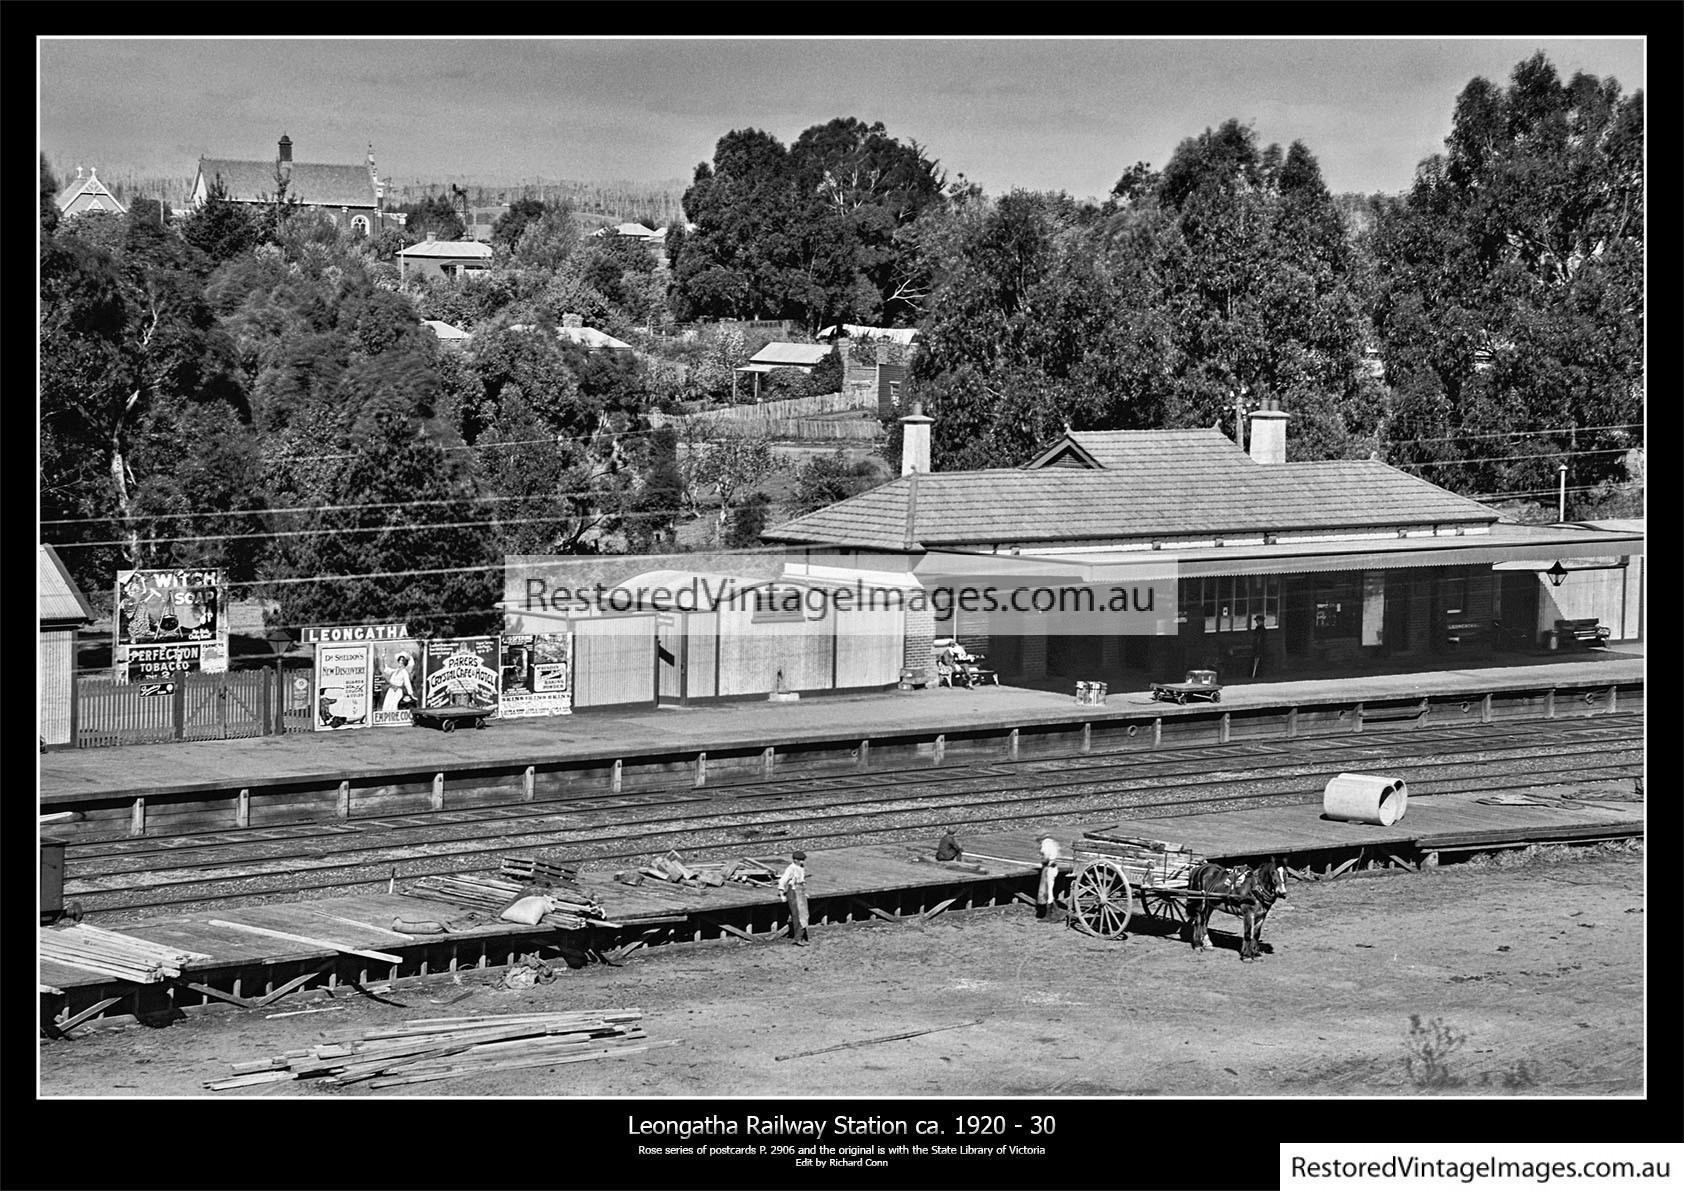 Leongatha Railway Station Ca. 1920-30